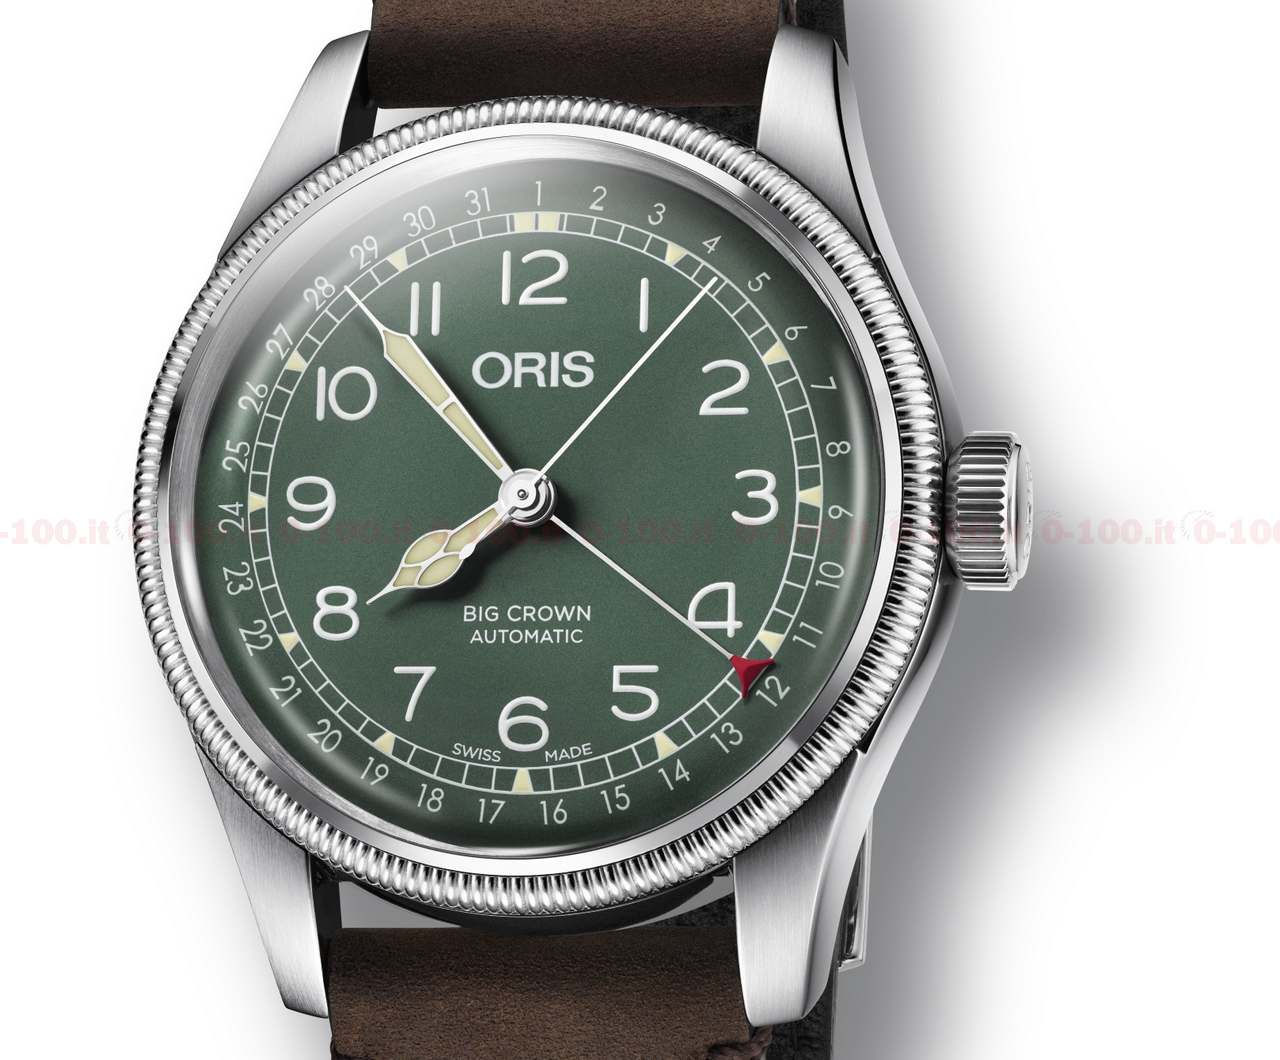 01 754 7741 4087-Set LS - Big Crown D.26 286 HB-RAG Oris Limited Edition